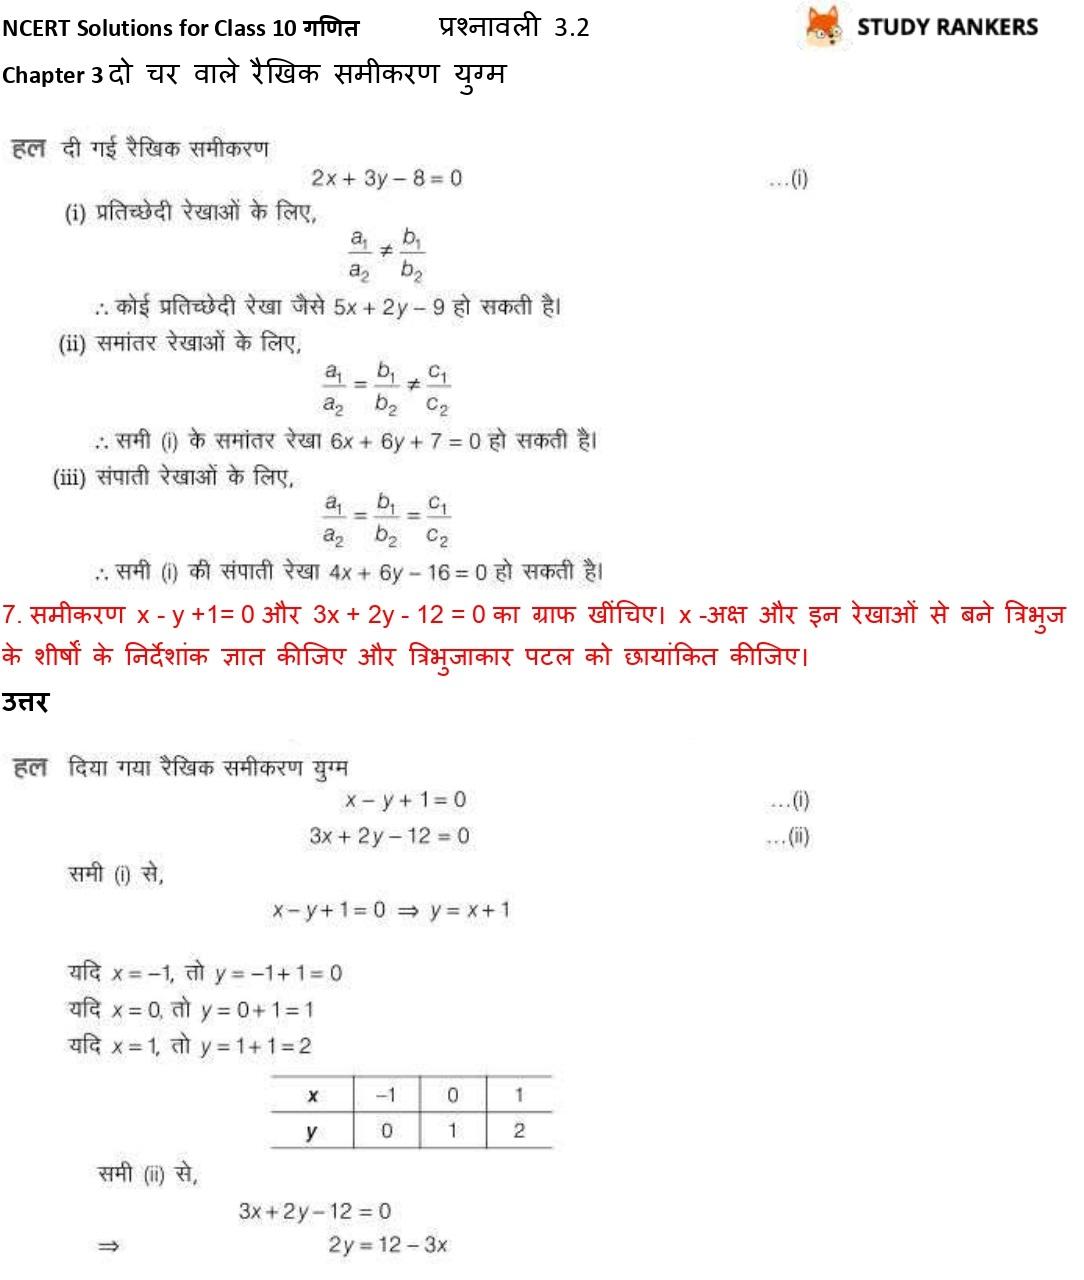 NCERT Solutions for Class 10 Maths Chapter 3 दो चर वाले रैखिक समीकरण युग्म प्रश्नावली 3.2 Part 11